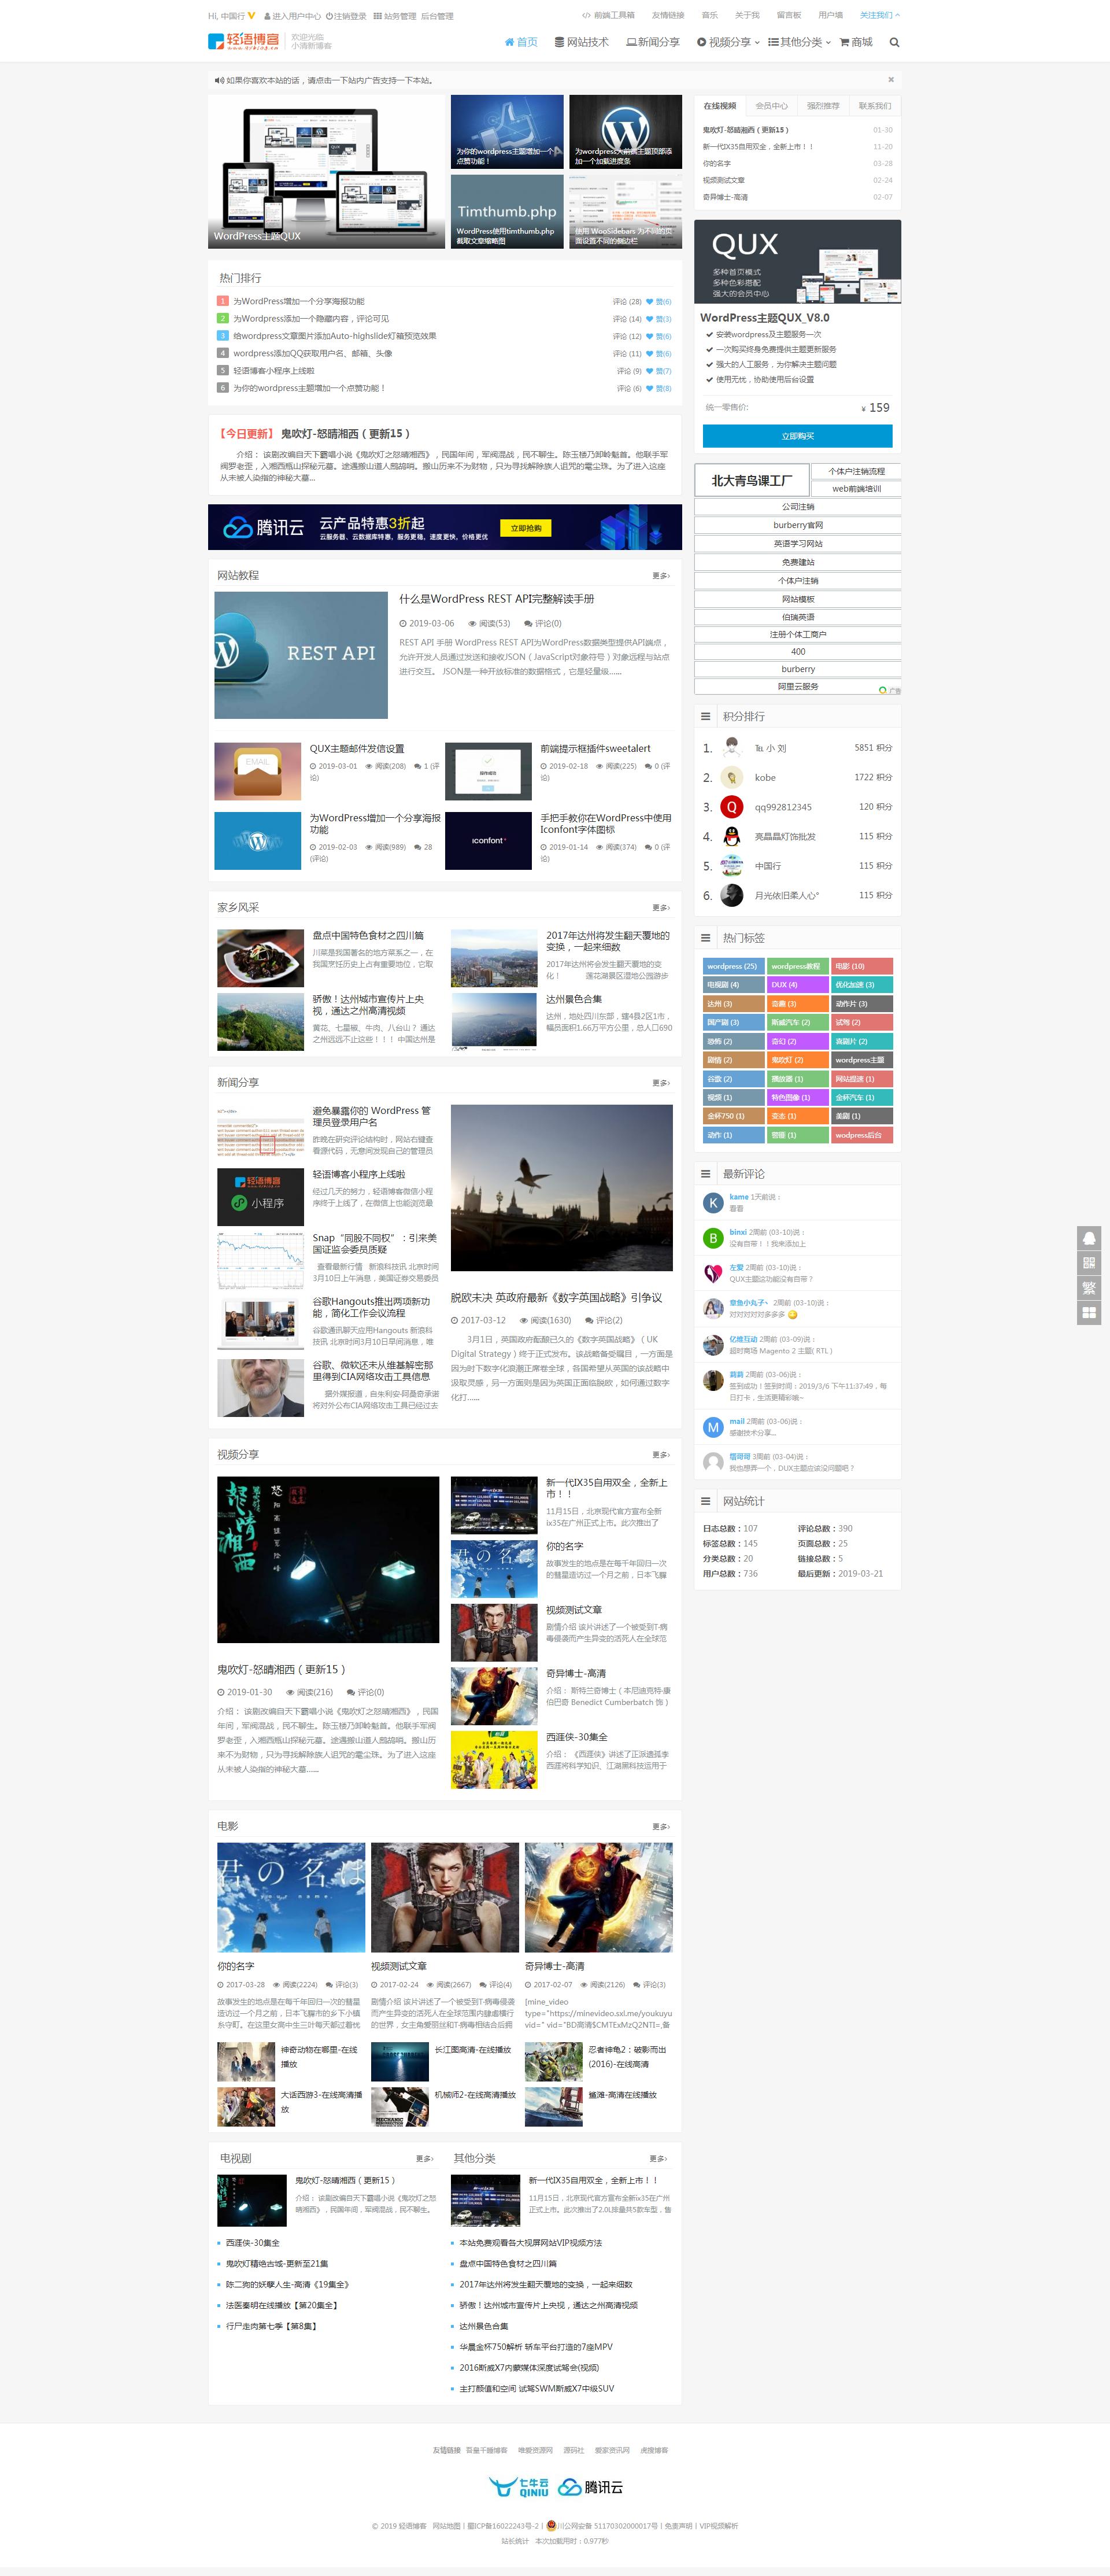 WordPress博客主题 QUX 9.1.5破解版